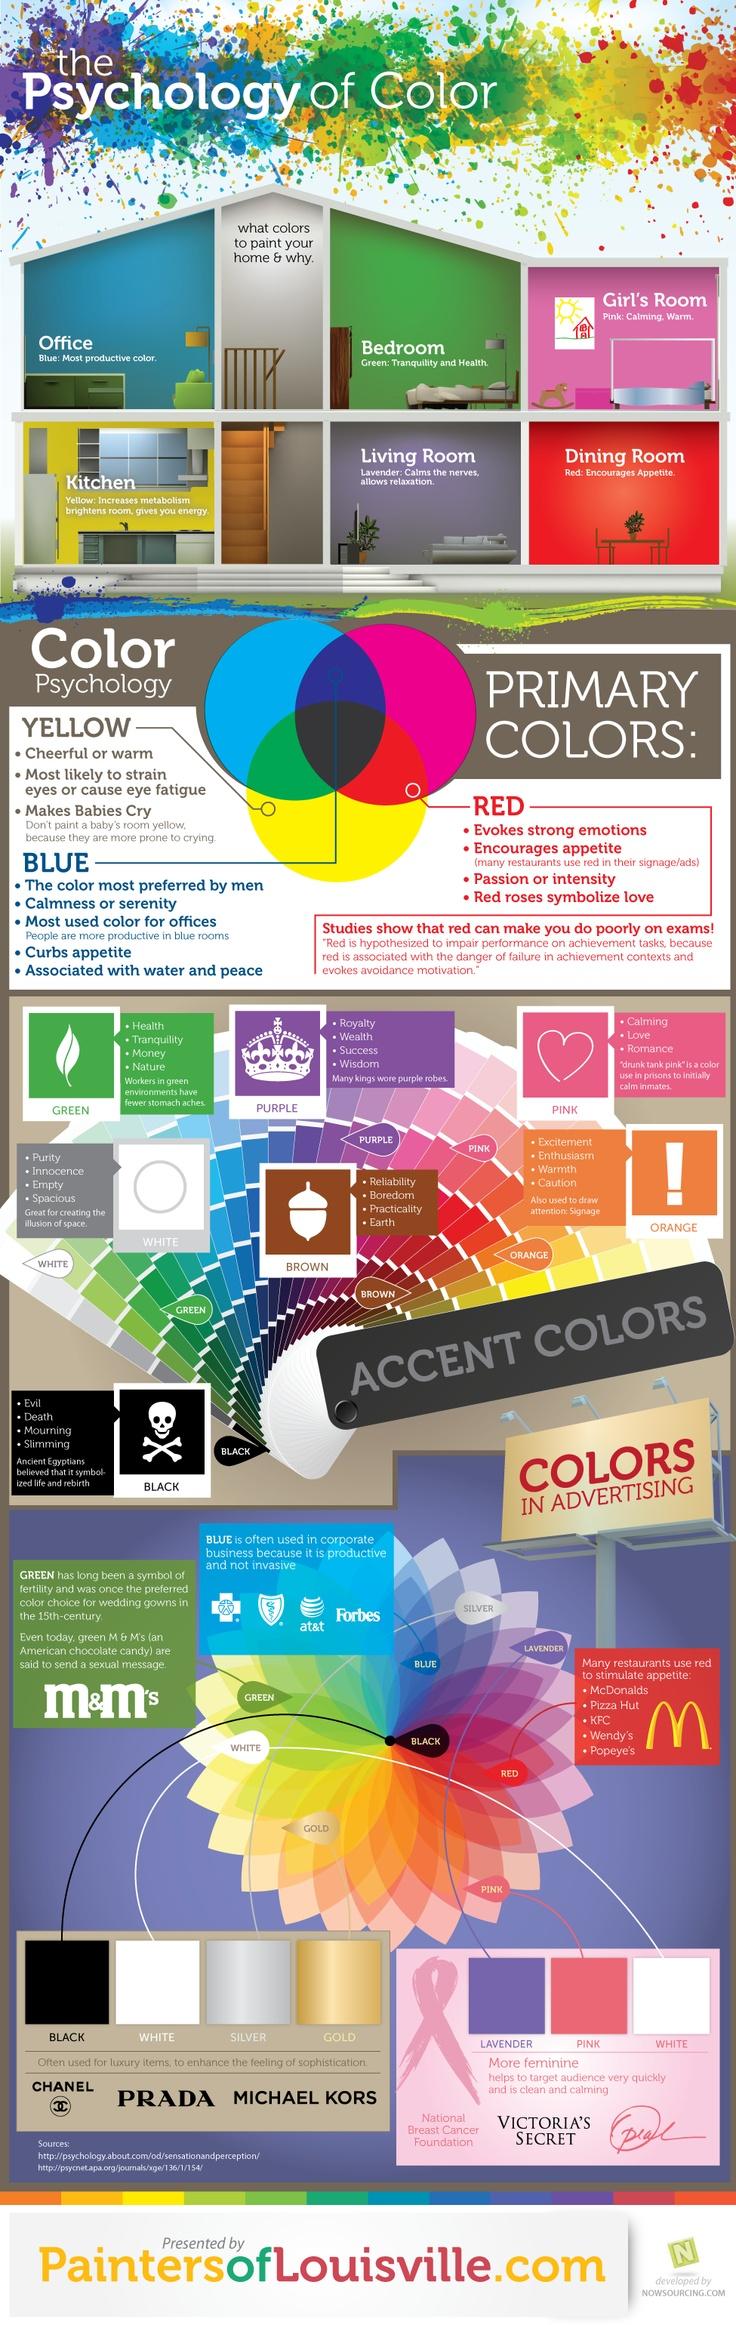 Psychology of Color: Colors Charts, Website, Web Site, Paintings Colors, Psychology Of Colors, Colors Psychology, Internet Site, Infographic, Rooms Colors